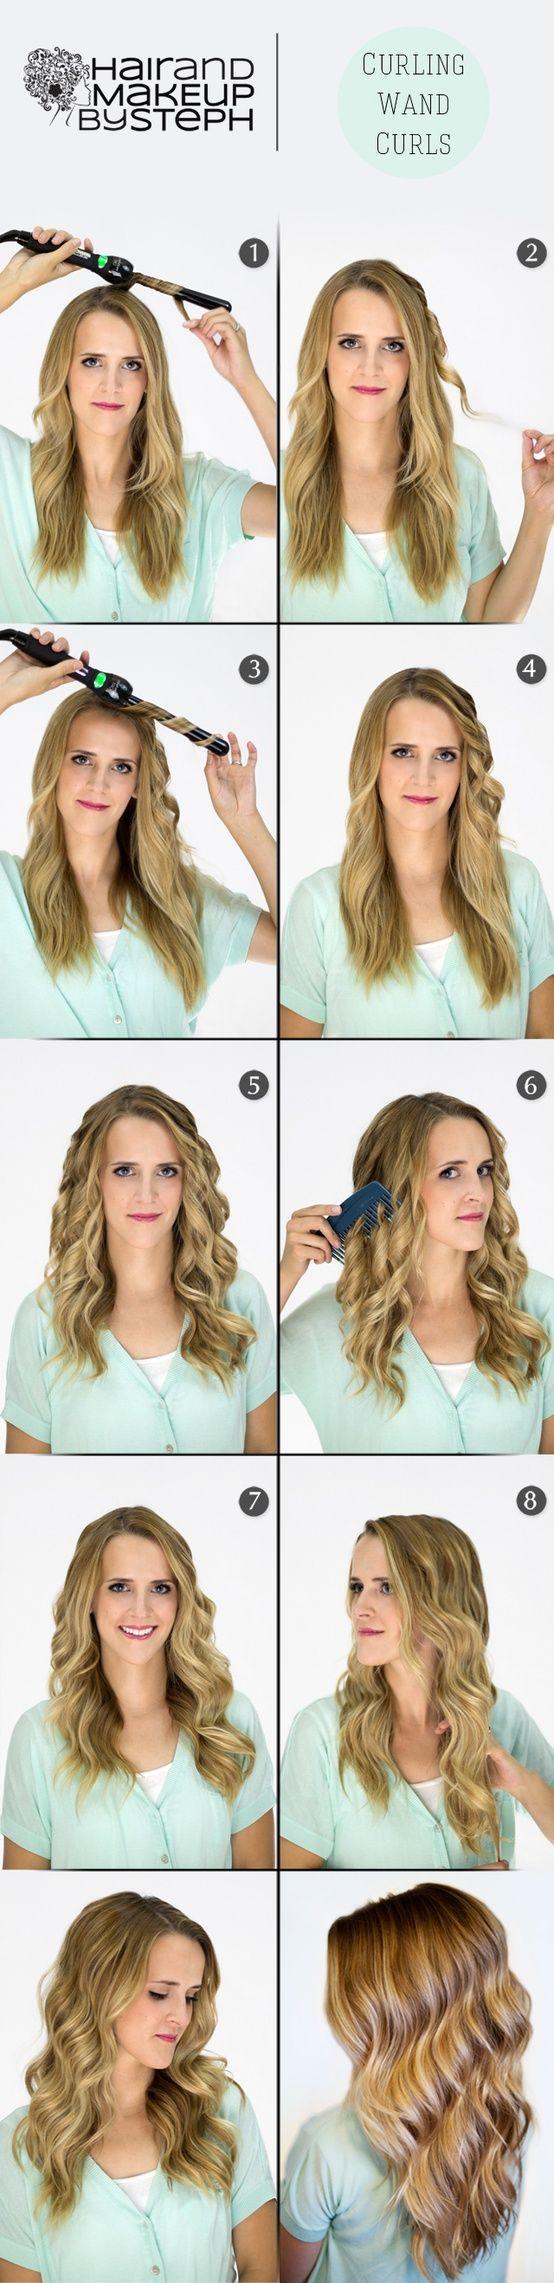 Curling Wand Waves Hair Pinterest Curling Wands